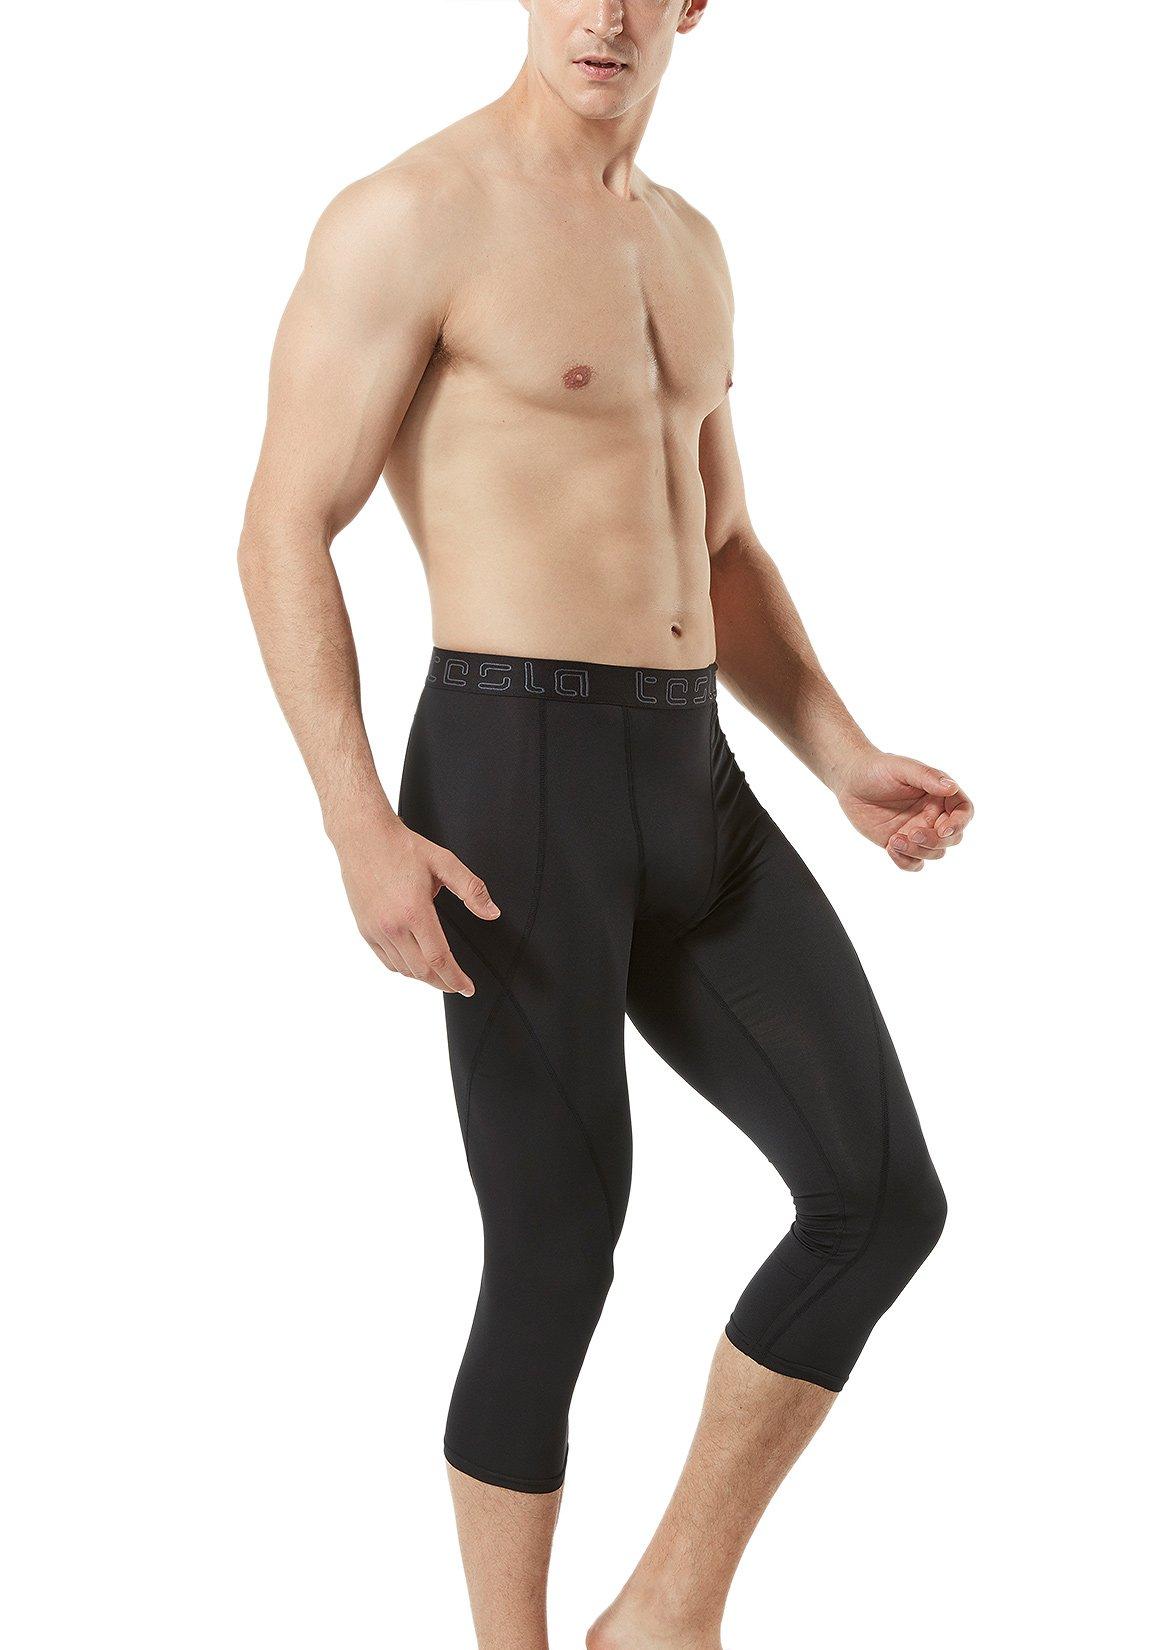 TM-MUC18-KLB_X-Small Tesla Men's Compression Capri Shorts Baselayer Cool Dry Sports Tights MUC18 by TSLA (Image #7)